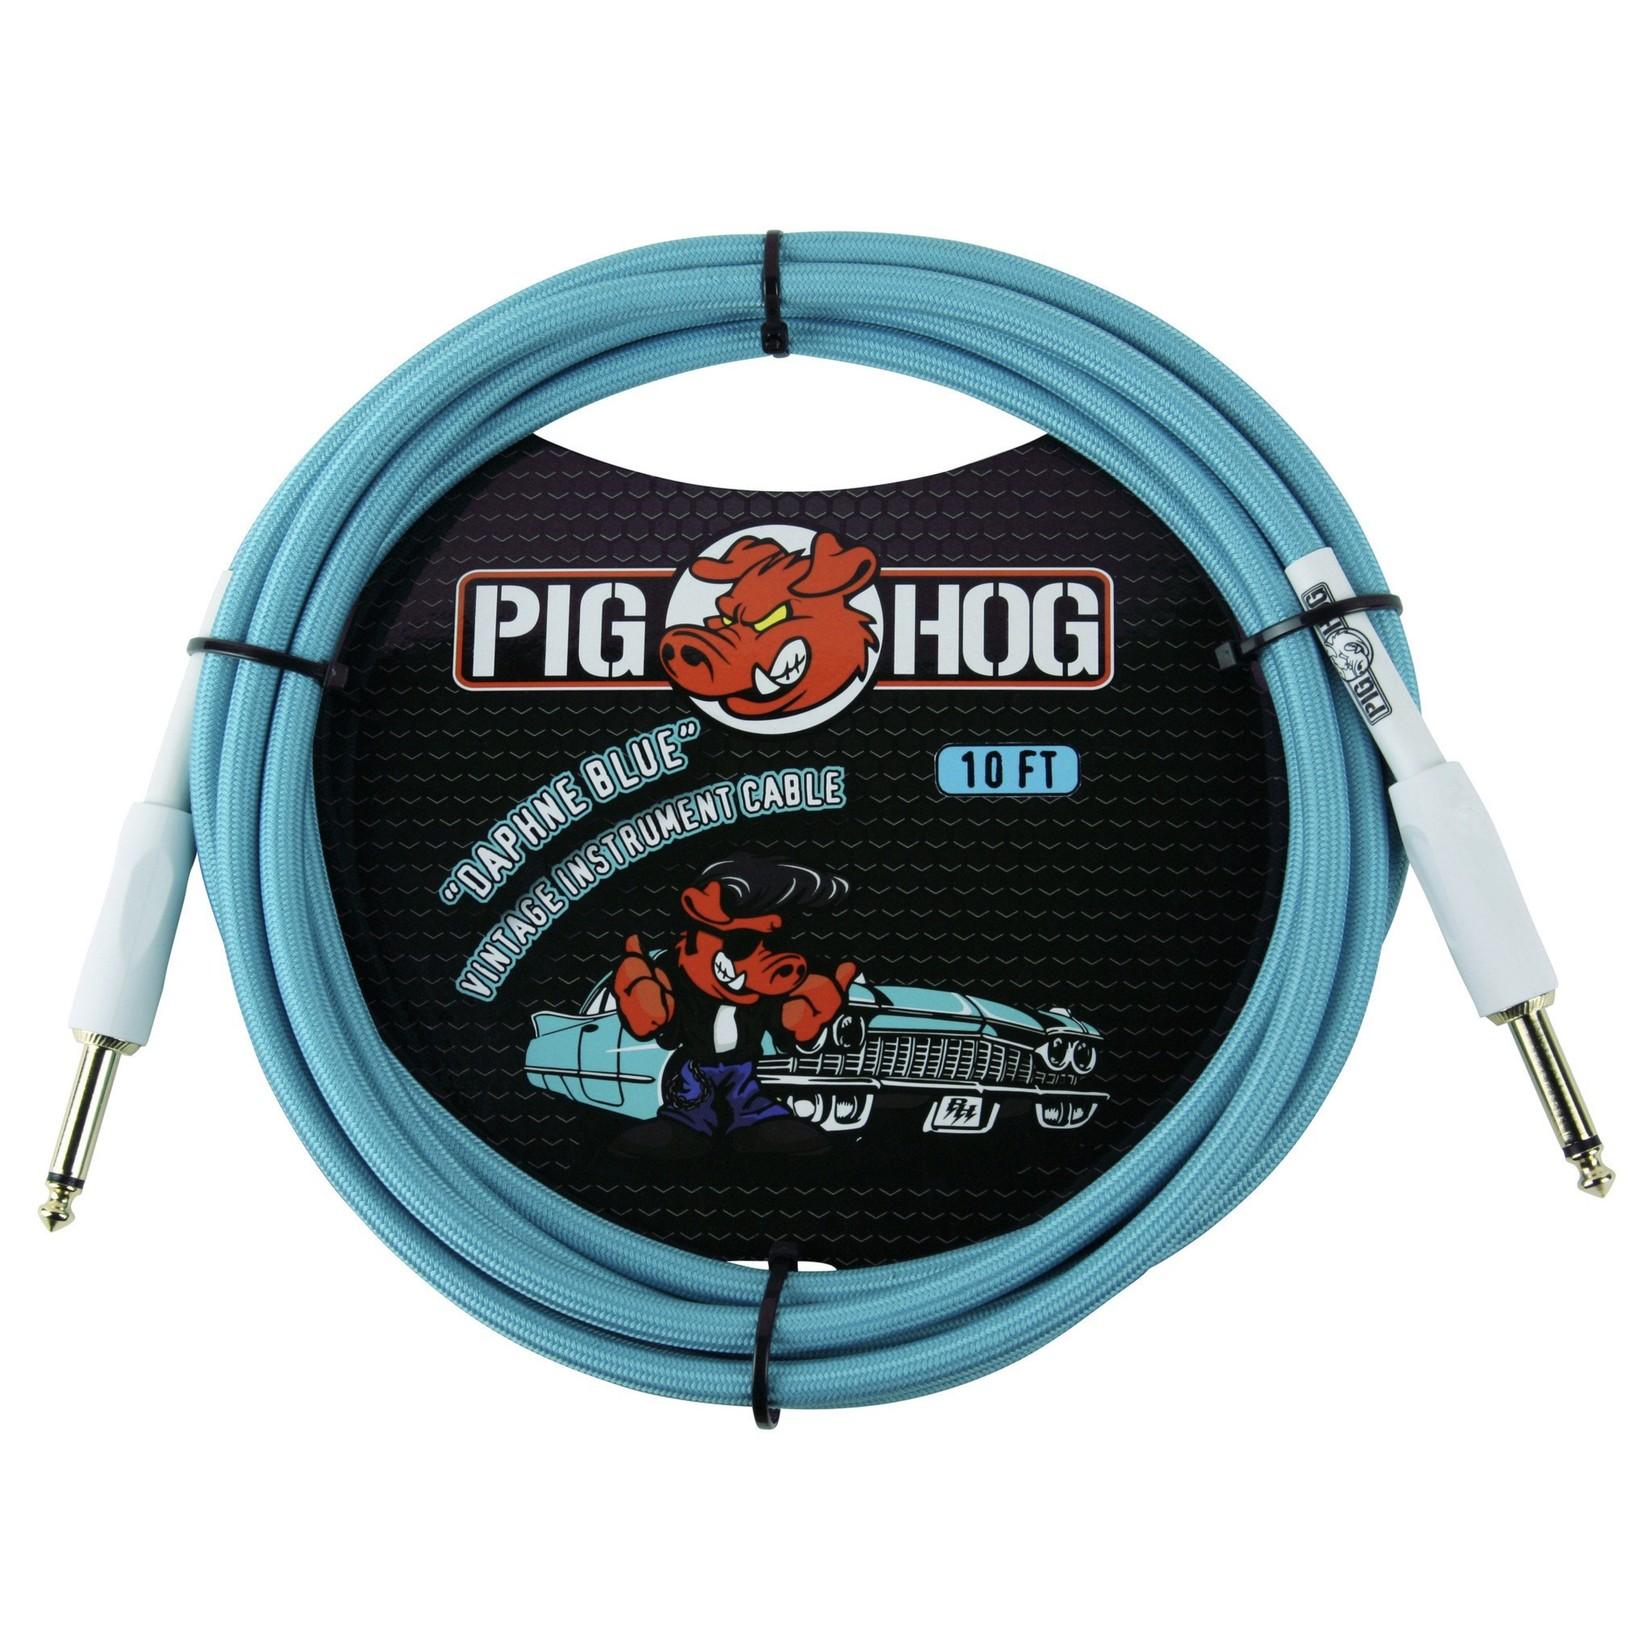 "Pig Hog Pig Hog ""Daphne Blue"" Vintage Instrument Cable - 10 FT - 1/4"" Straight-Straight (PCH10DB)"